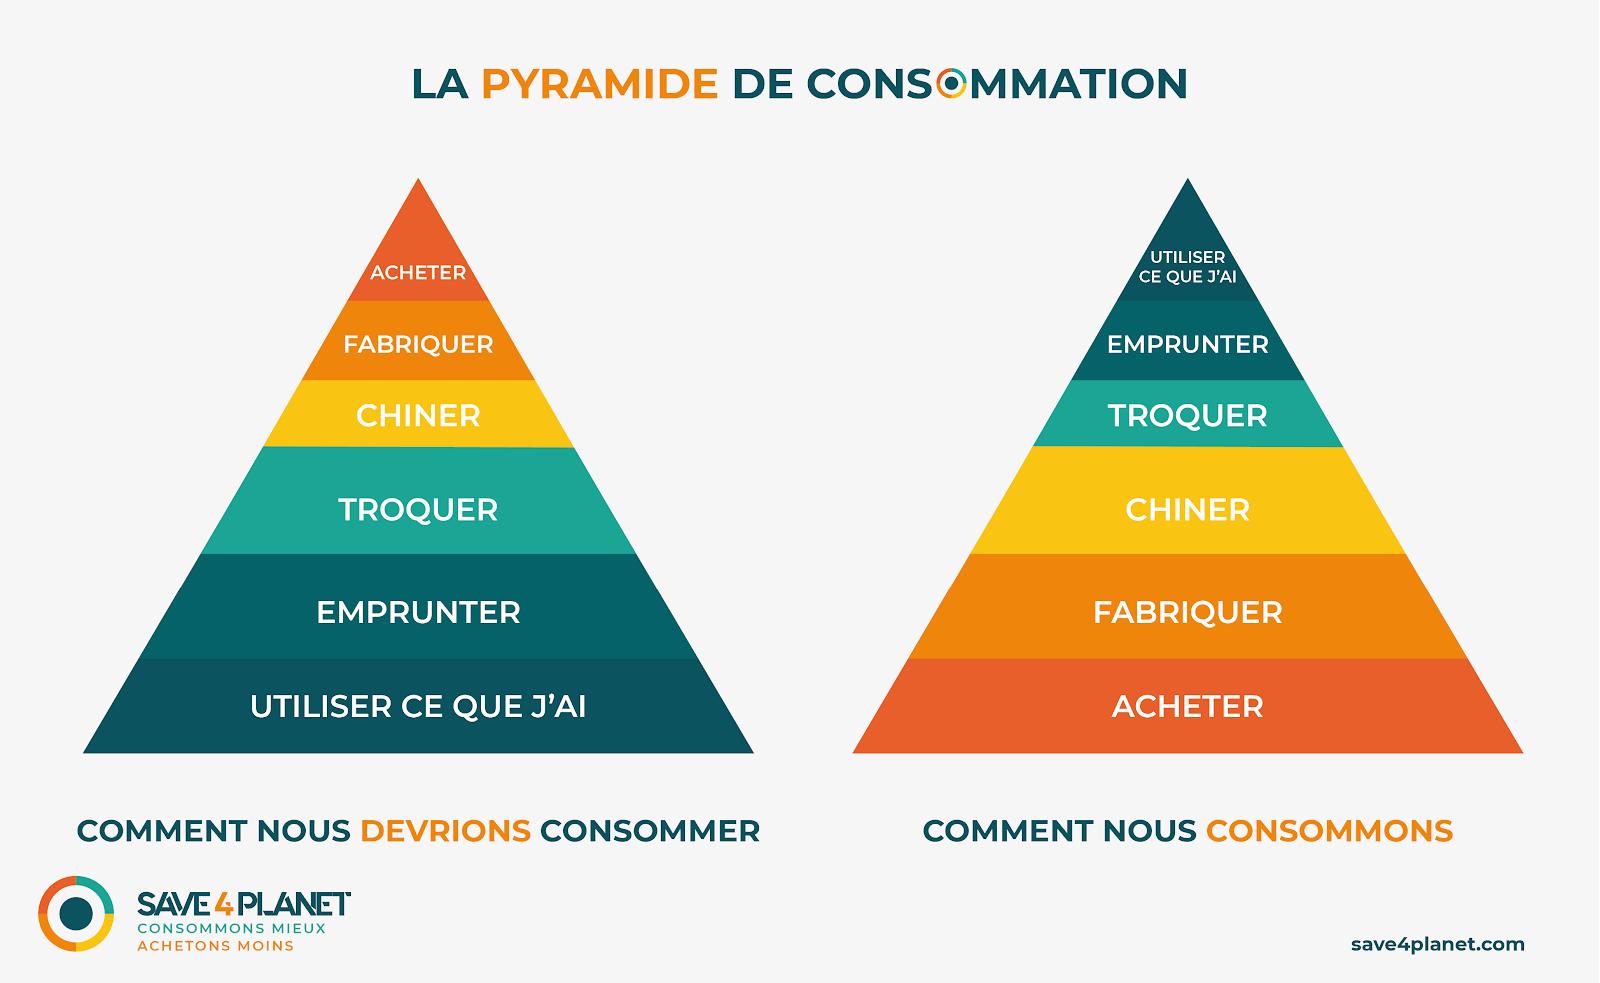 Illustration de la pyramide de consommation